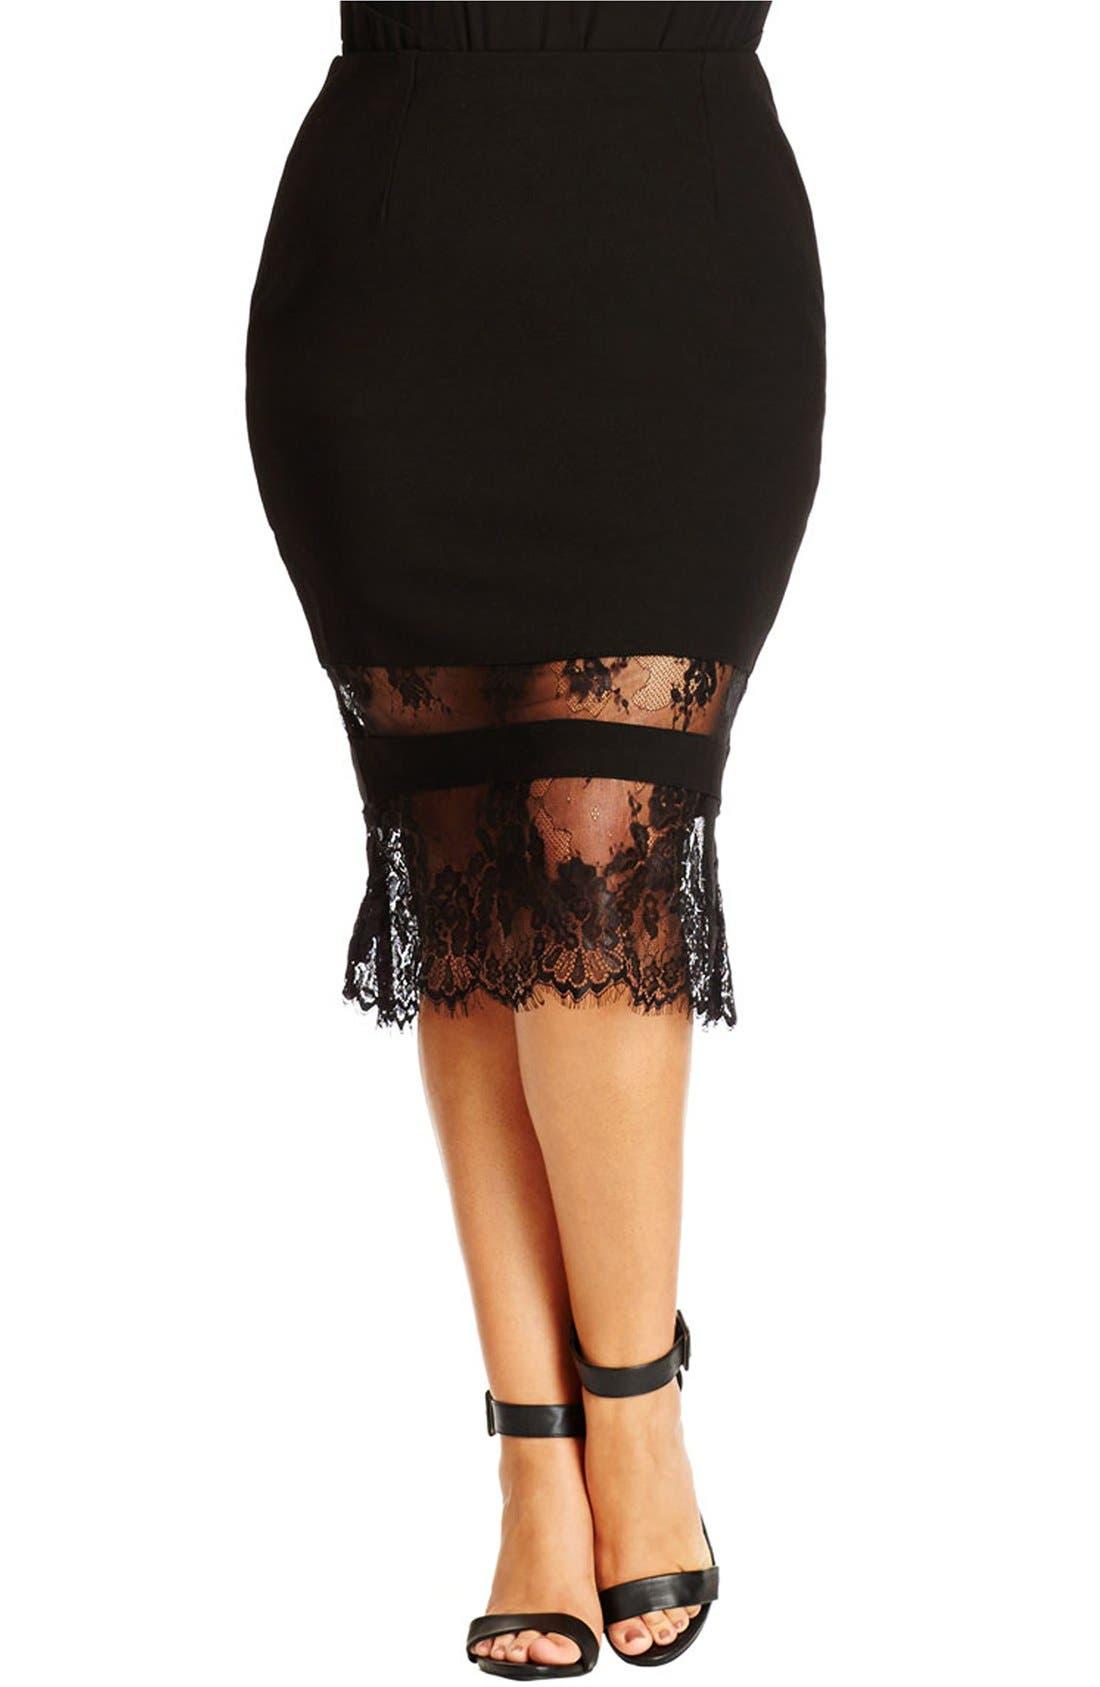 Alternate Image 1 Selected - City Chic Lace Hem Tube Skirt (Plus Size)